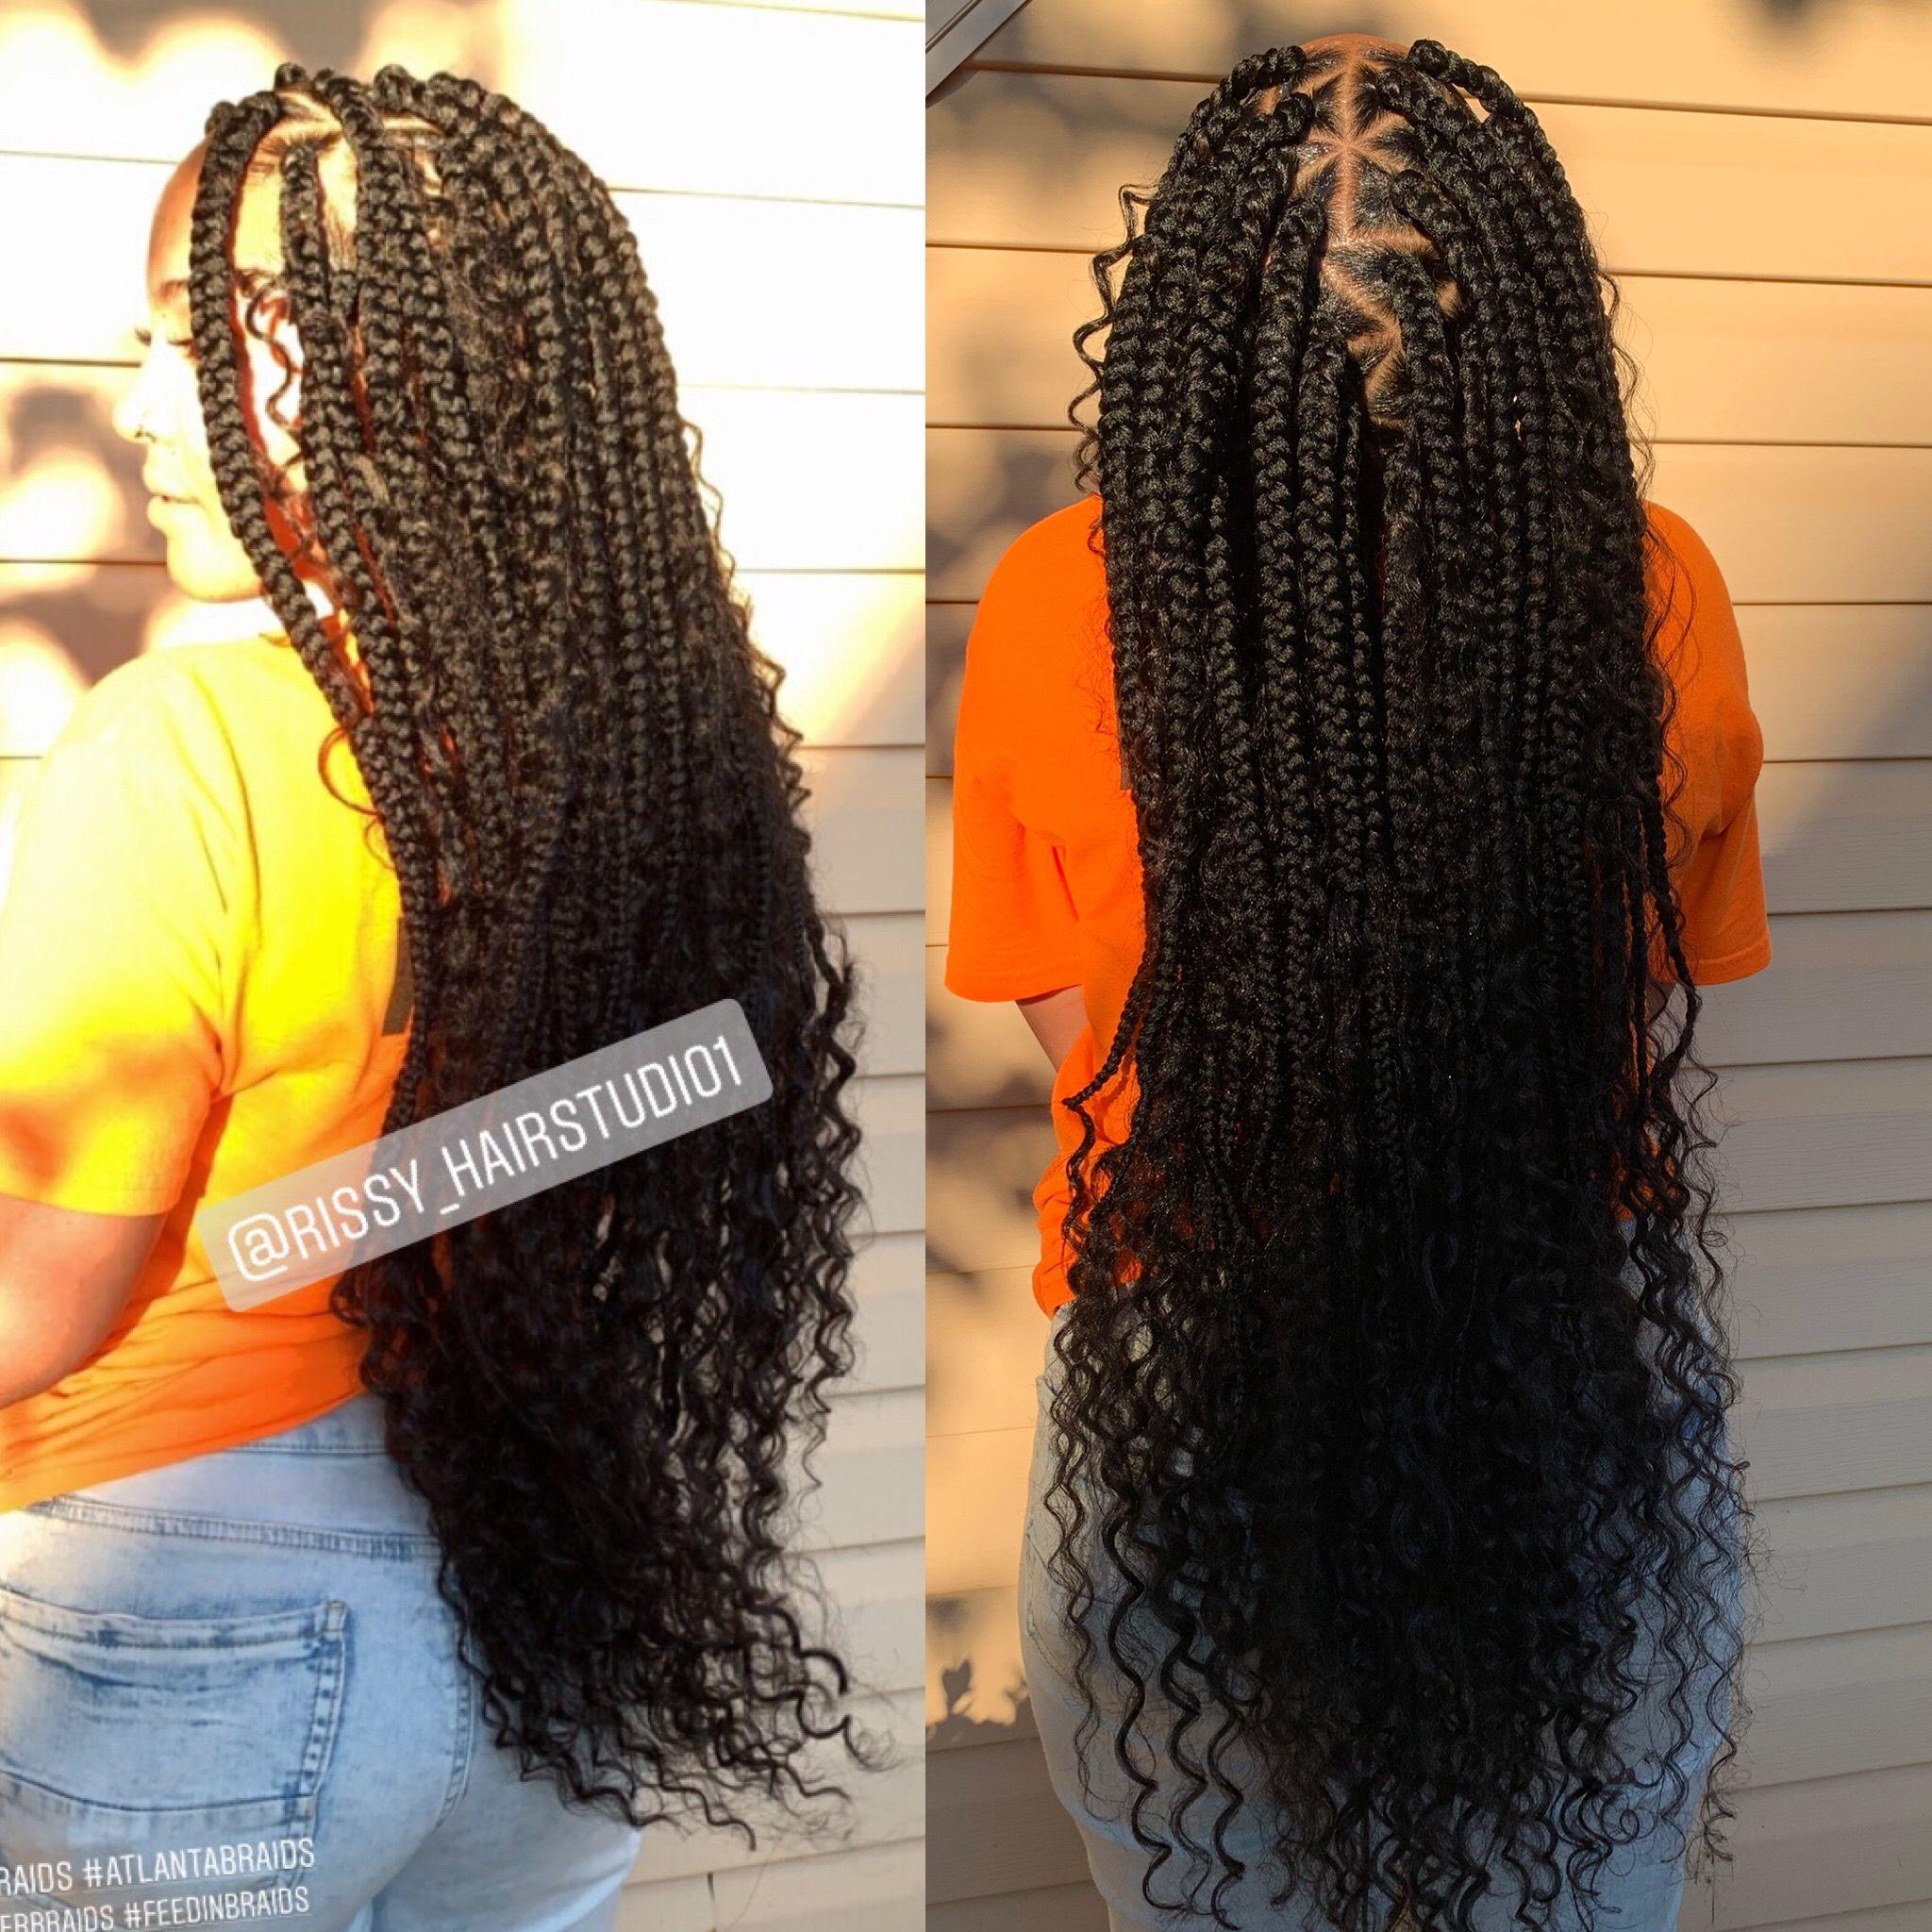 Triangle Part Boho Braids Braids With Curls Hair Styles Box Braids Hairstyles